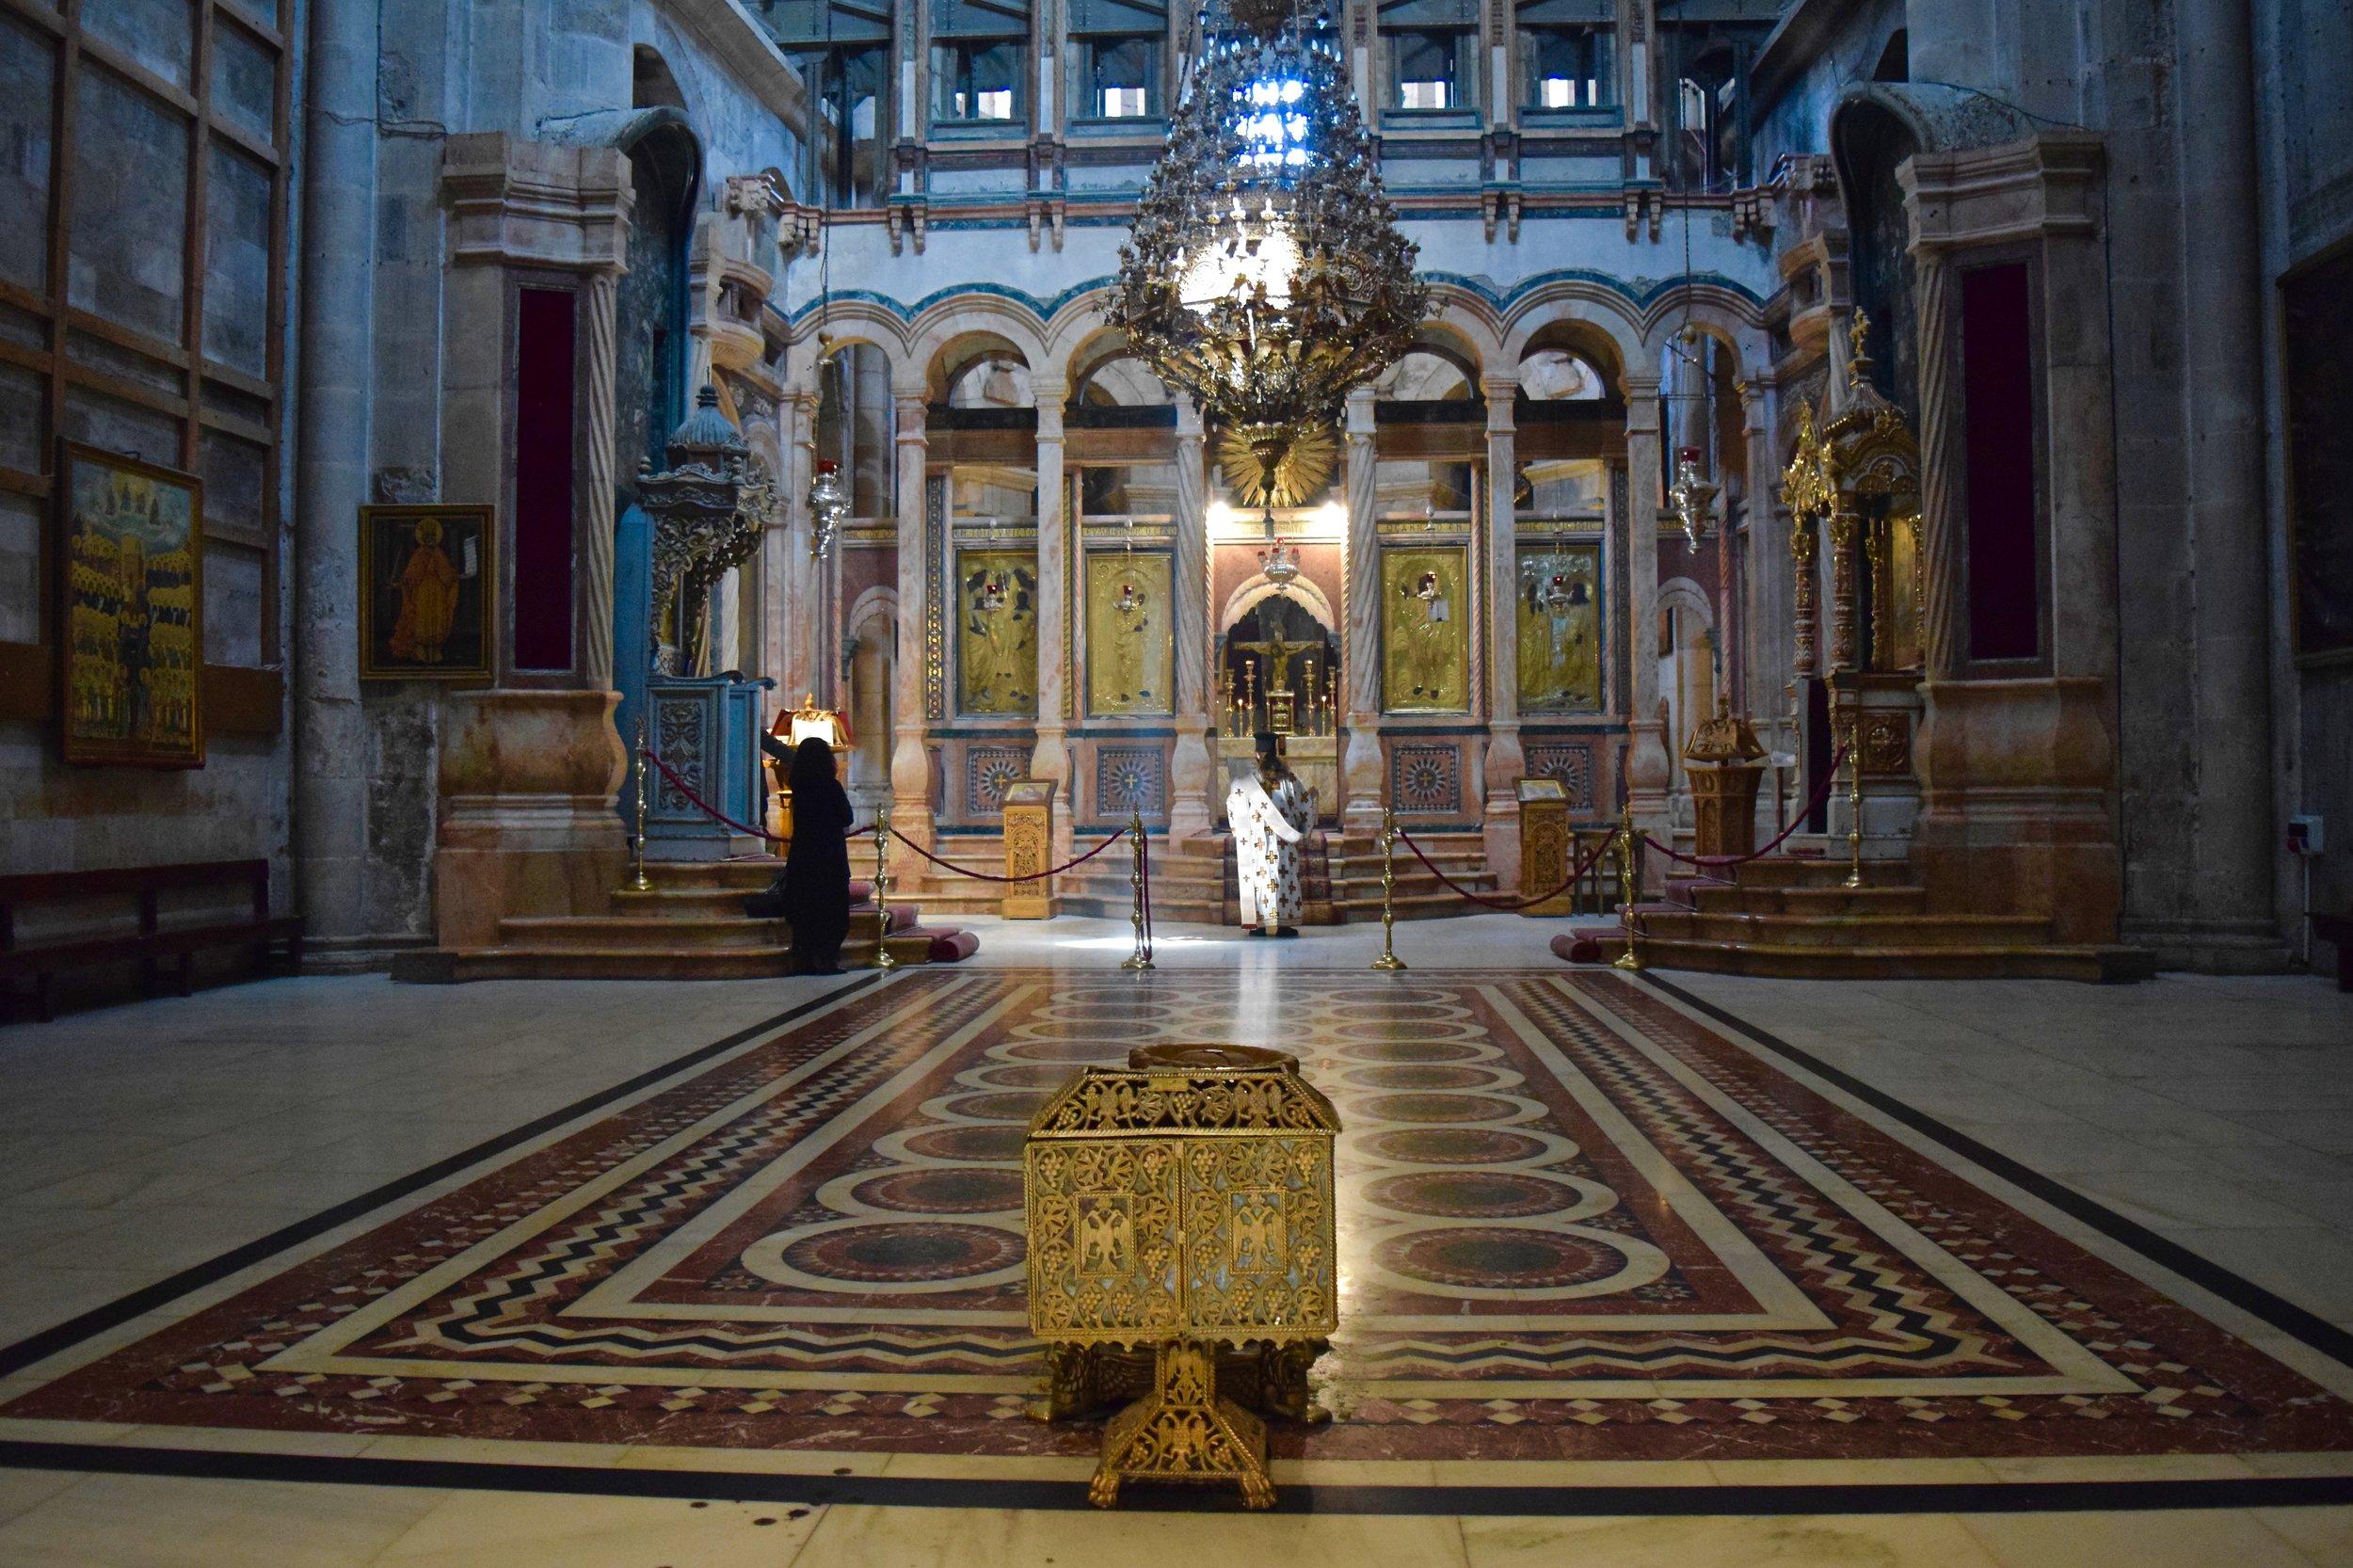 Katholikon of the church